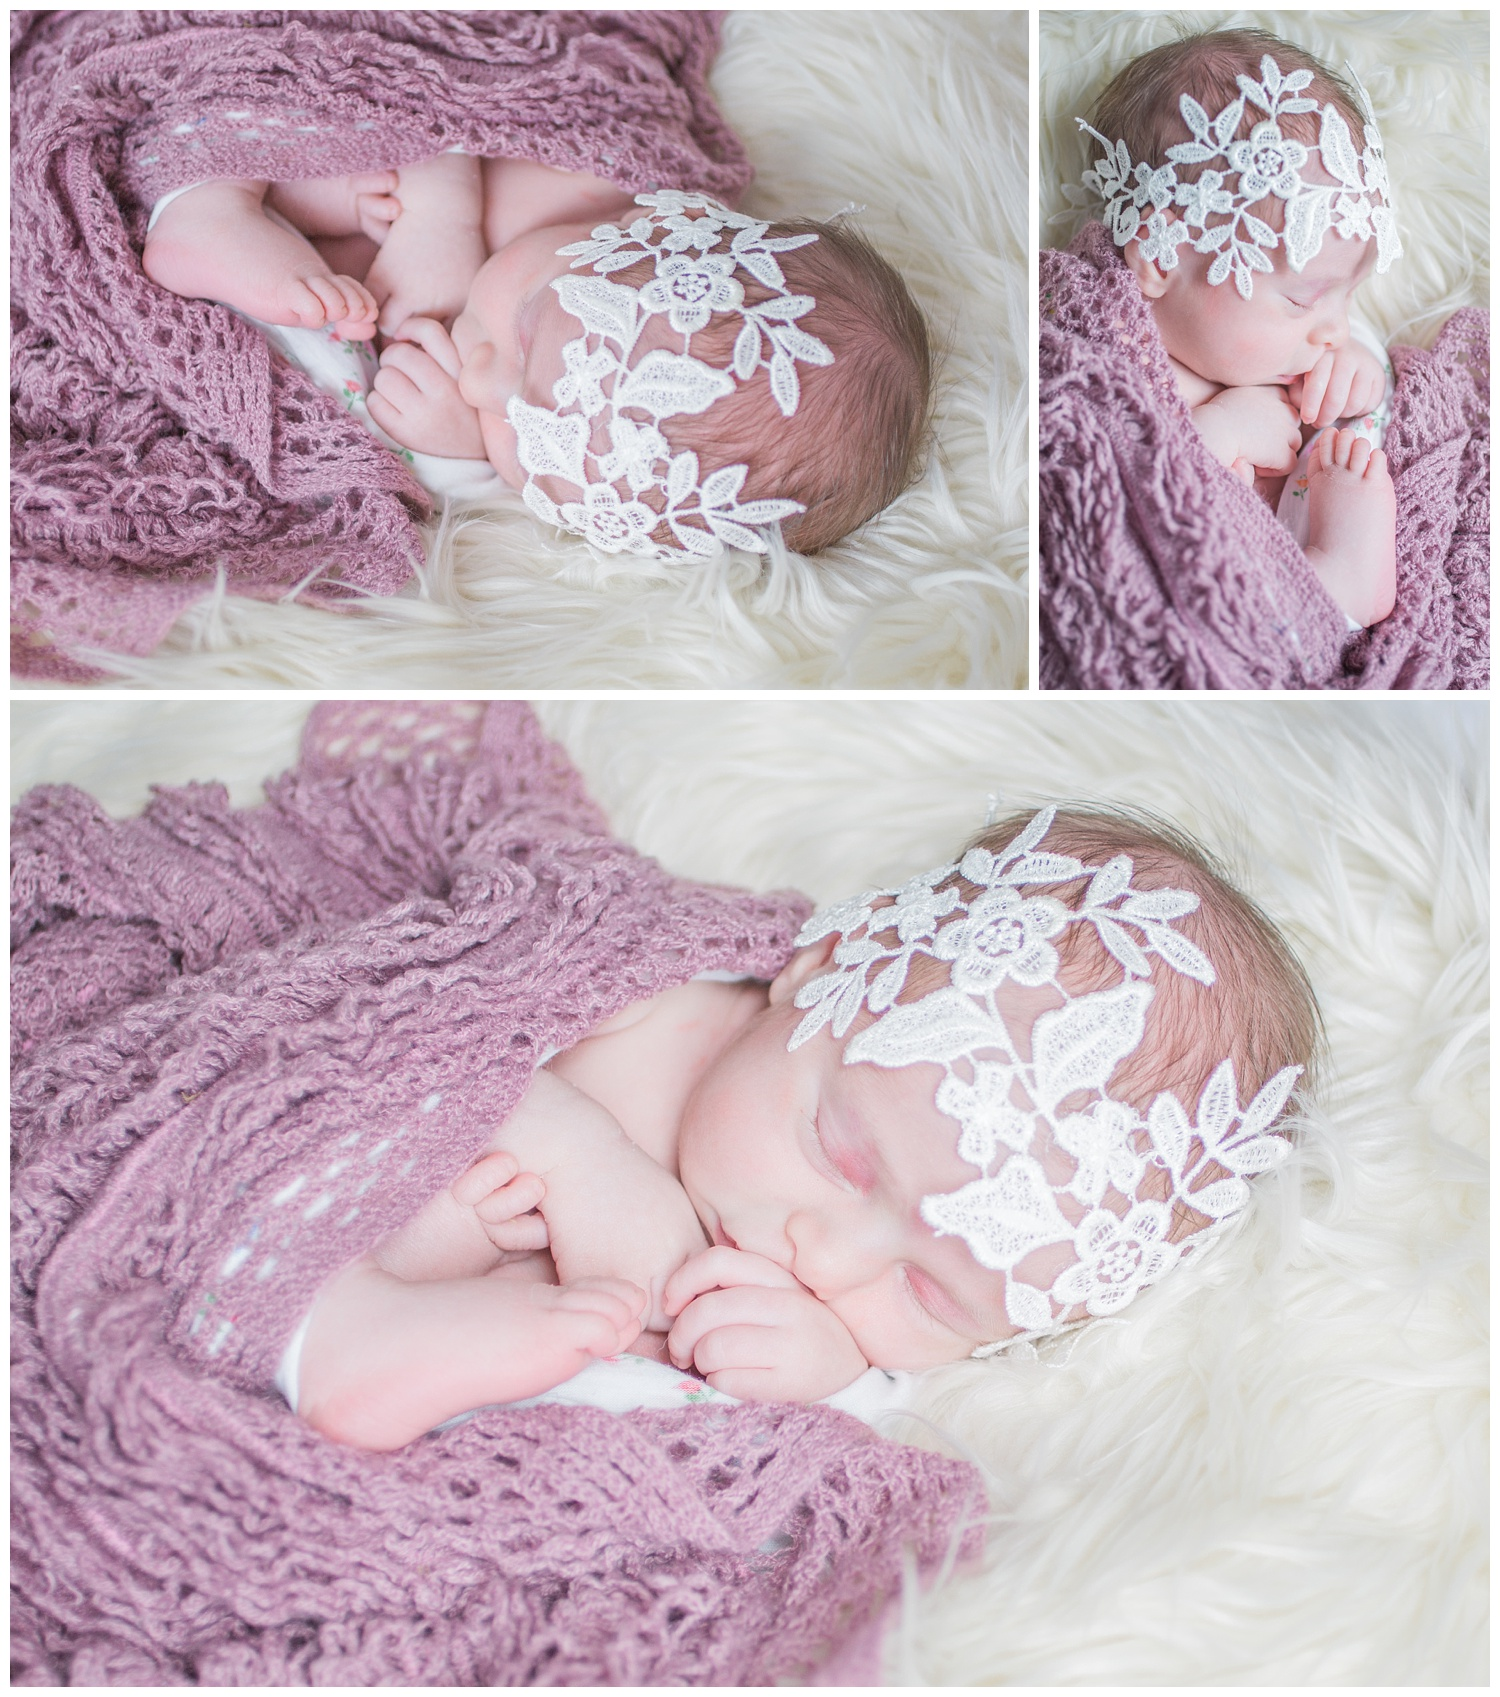 Lucy newborn photography rochester ny 10.jpg